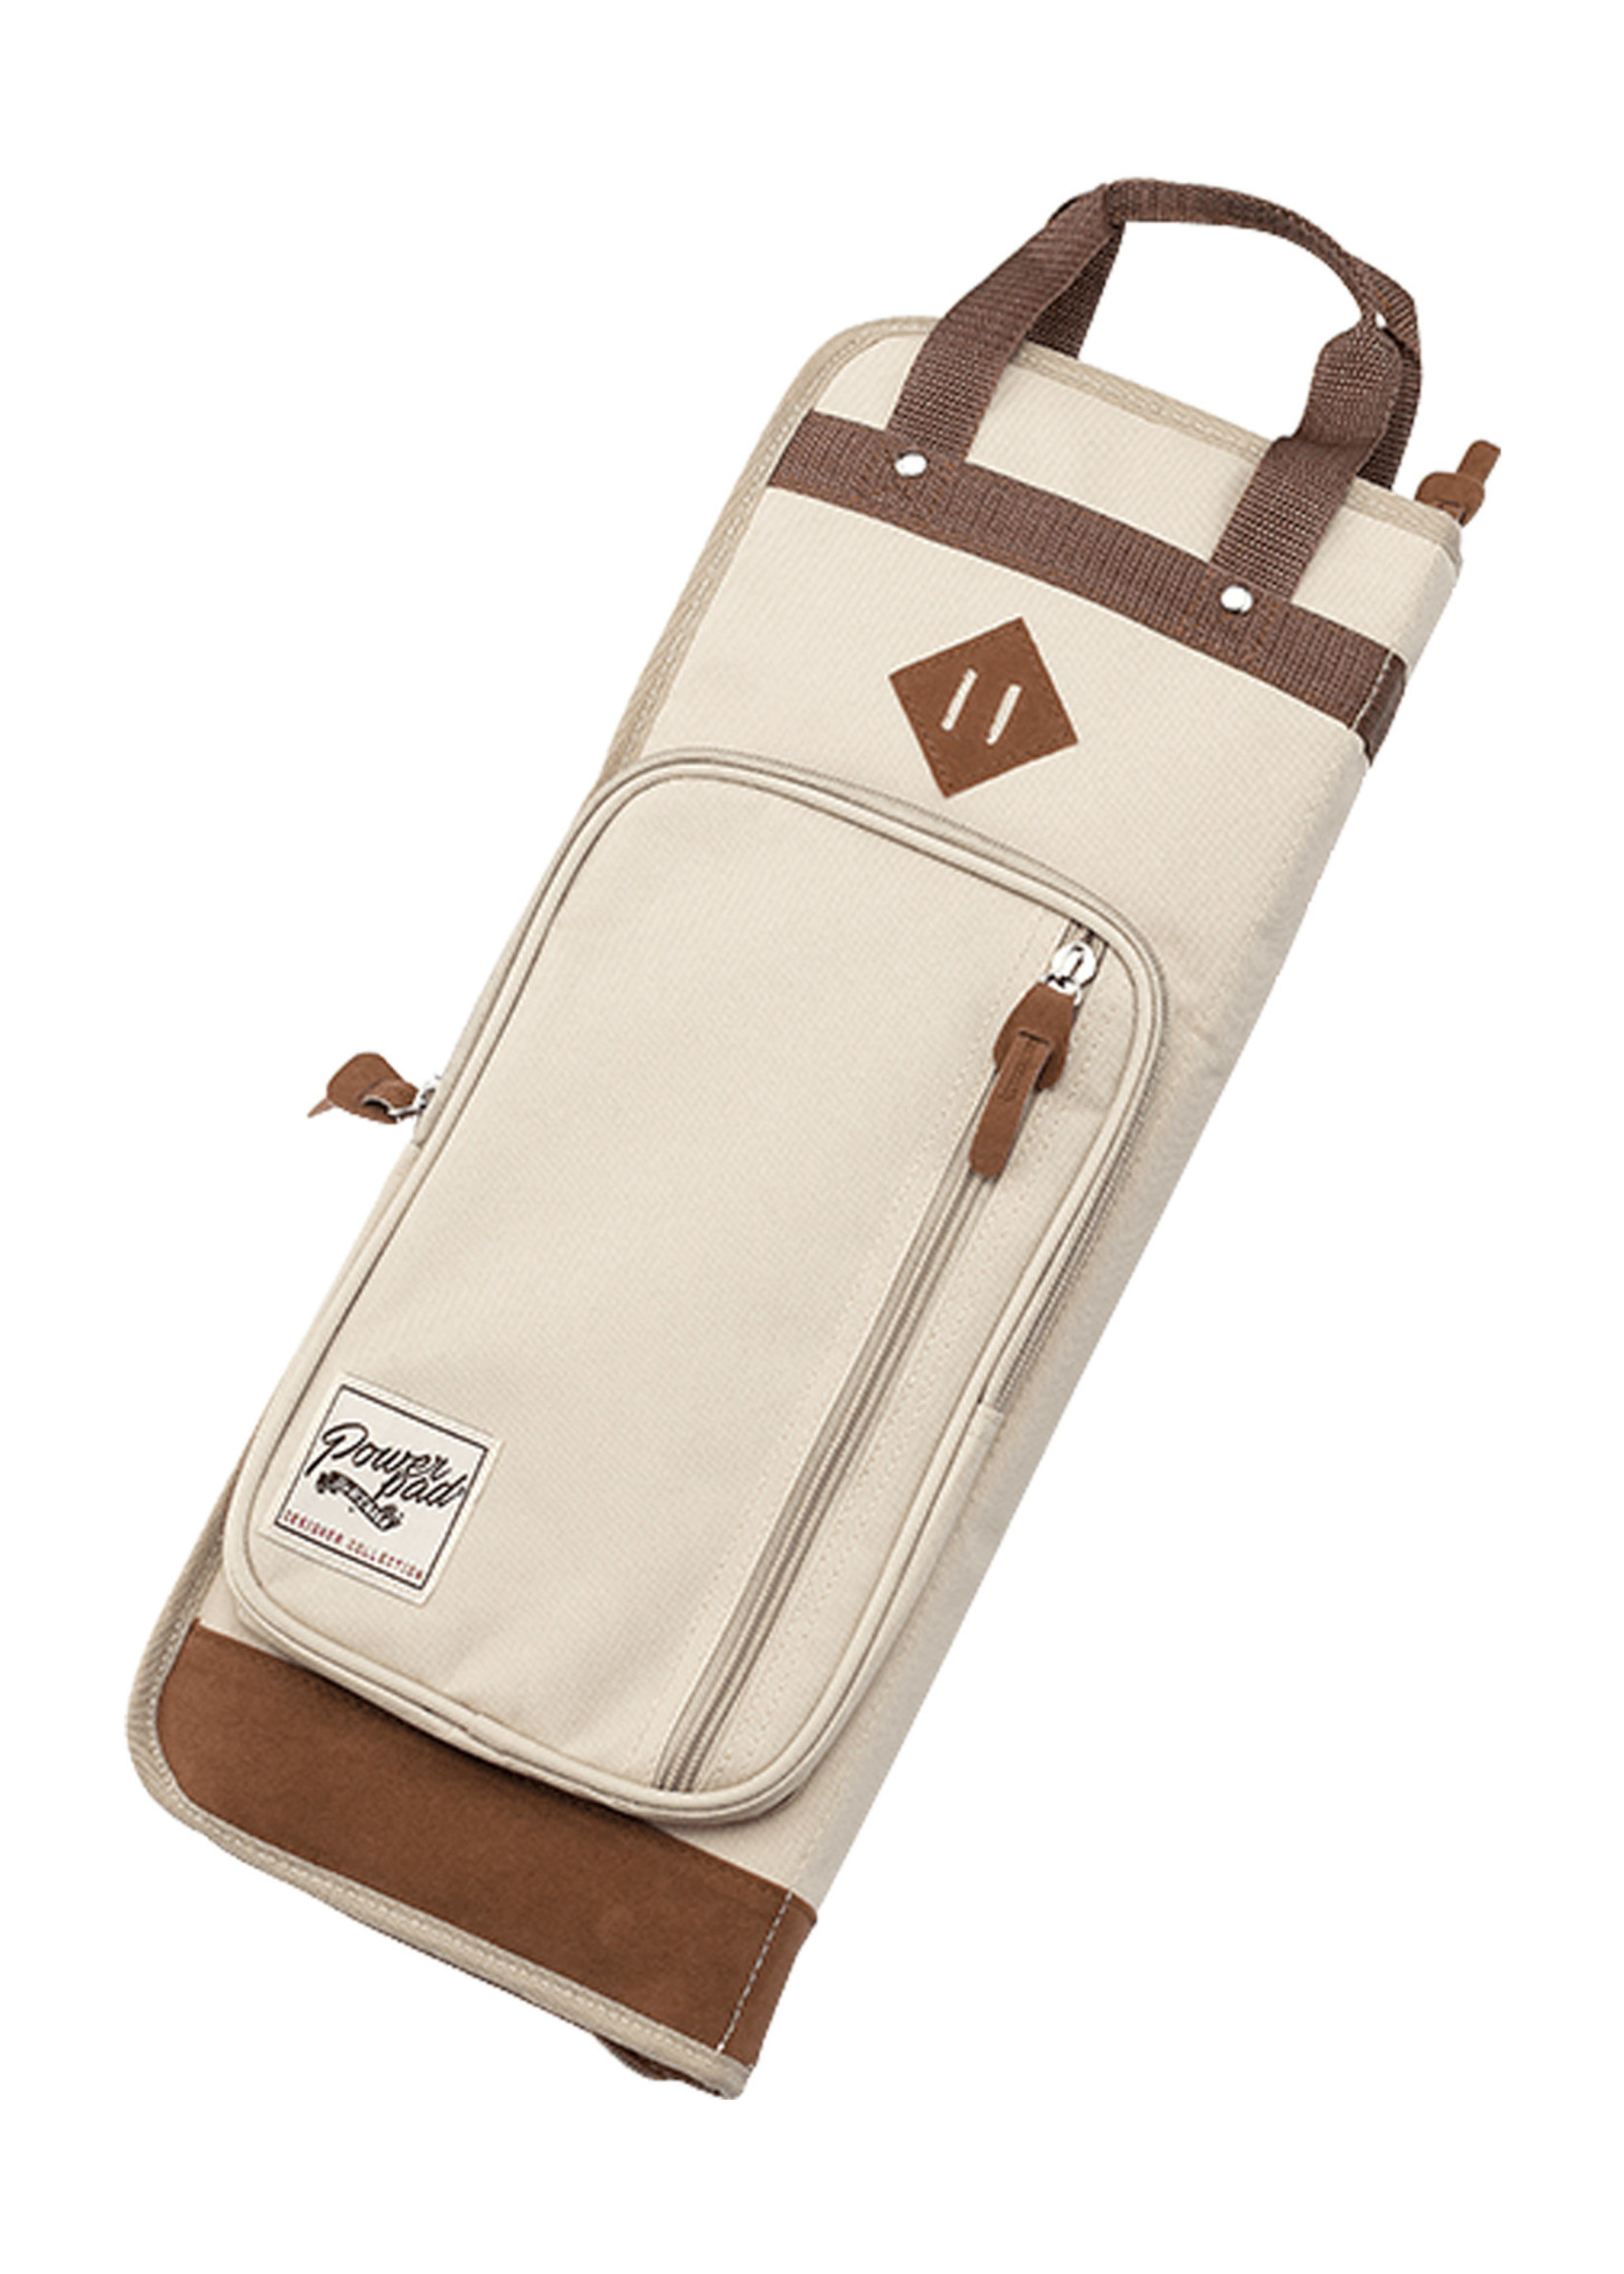 Tama Tama TSB24BE Stick Bag Tan